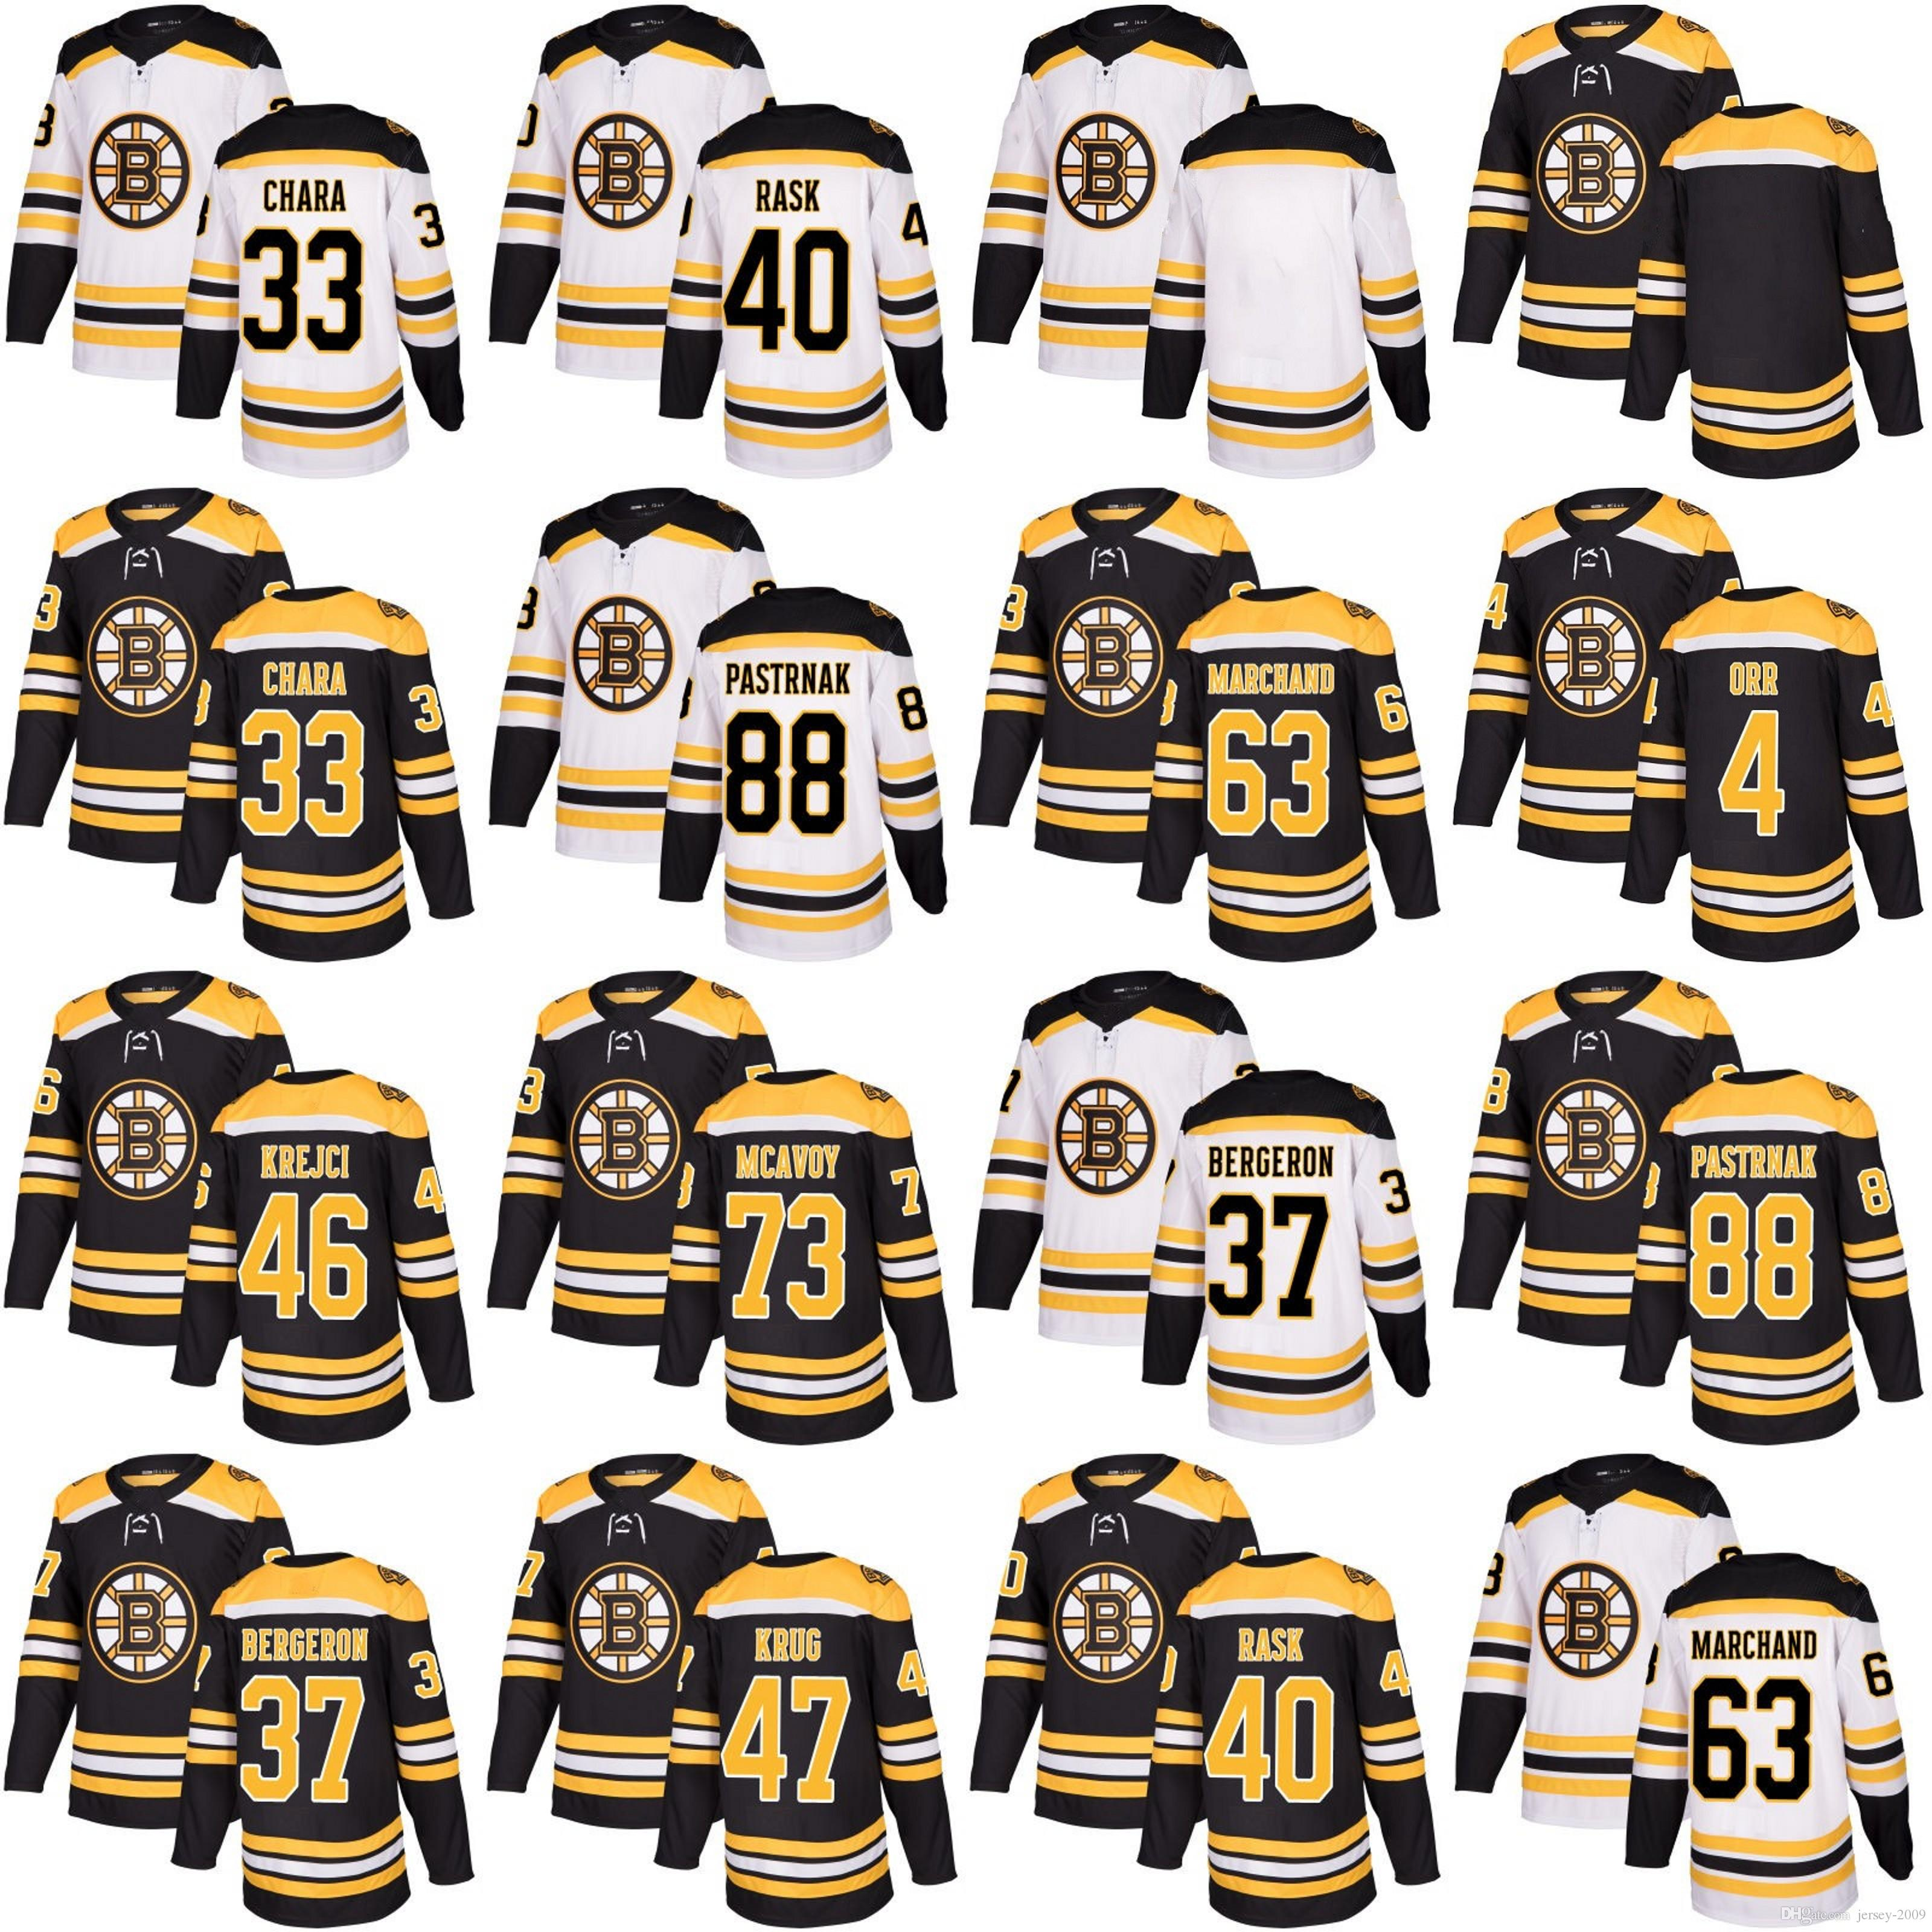 05a5e38b088 Acquista 2018 Boston Bruins 88 David Pastrnak 46 David Krejci 37 Patrice  Bergeron 63 Brad Marchand 33 Zdeno Chara 40 Rask Torey Krug Maglie Da  Hockey A ...